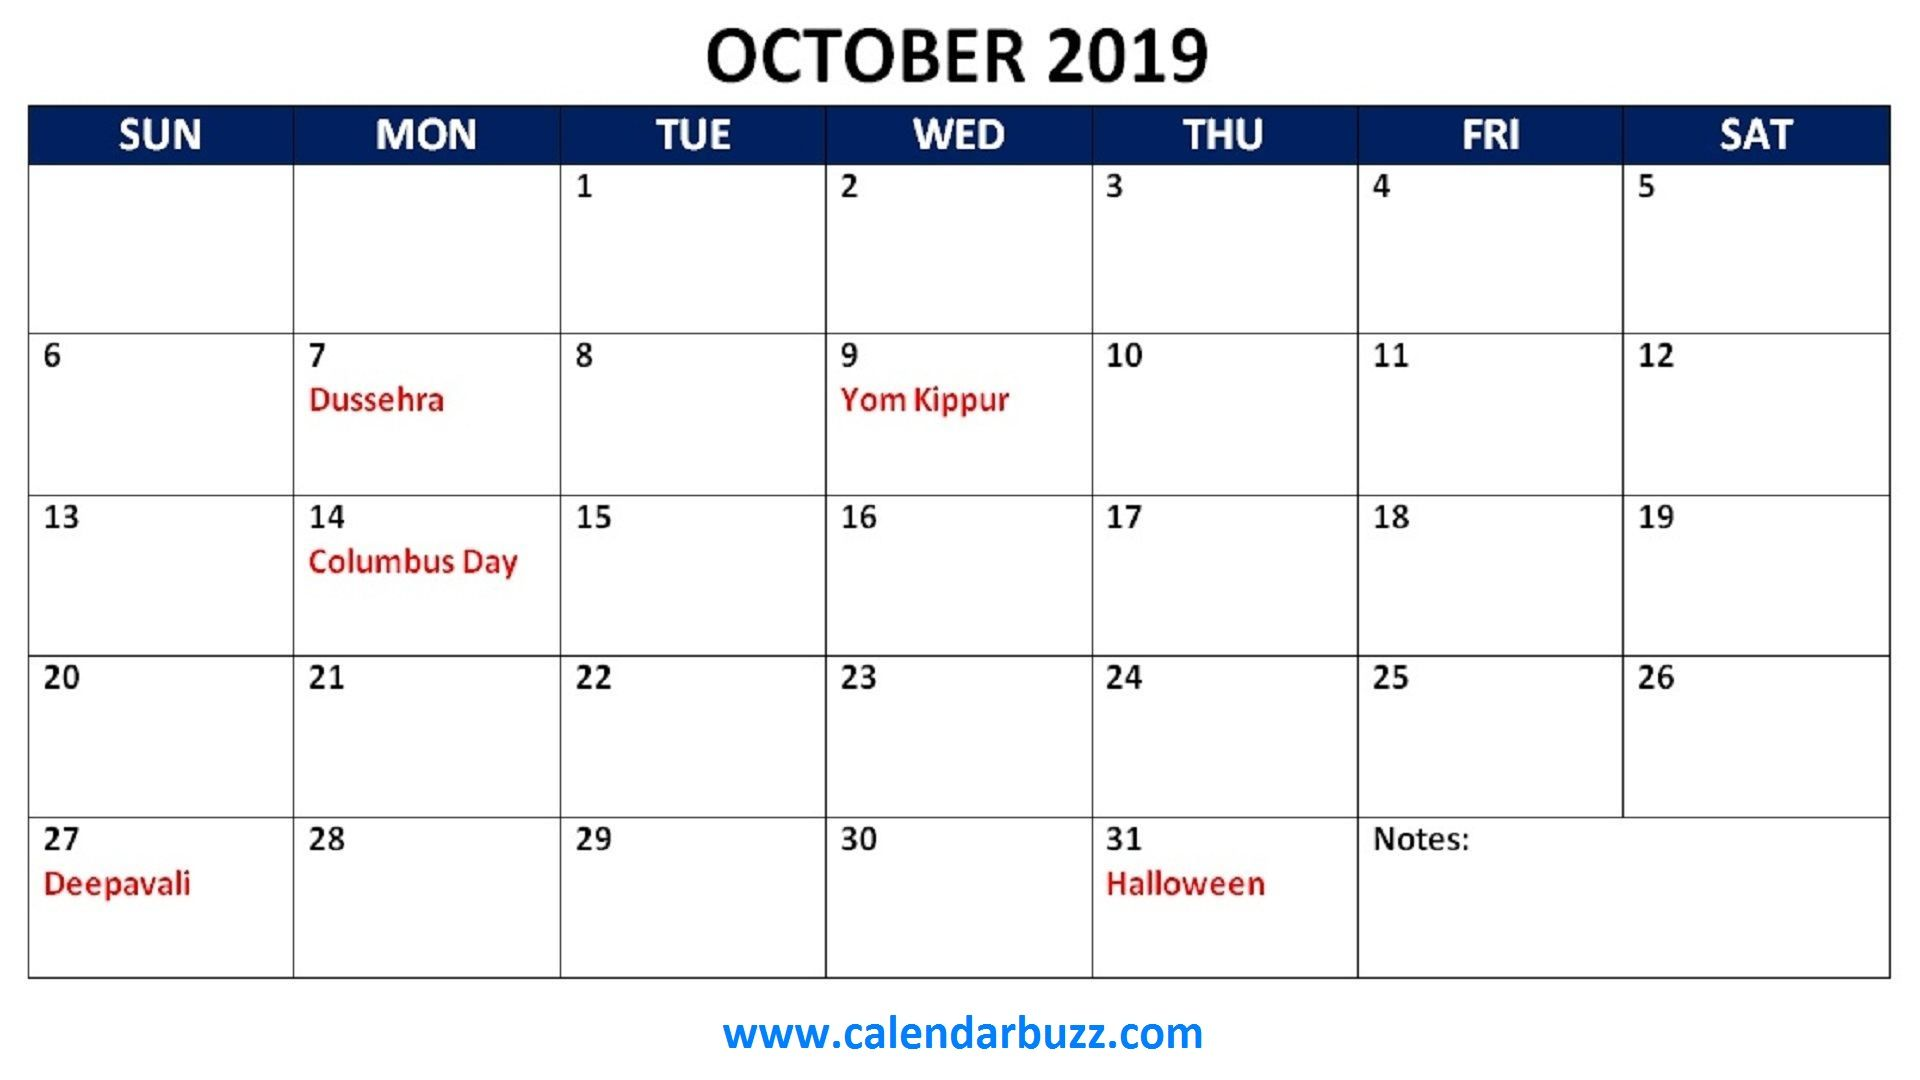 october 2019 holidays calendar printable October calendar 2019 1920x1080